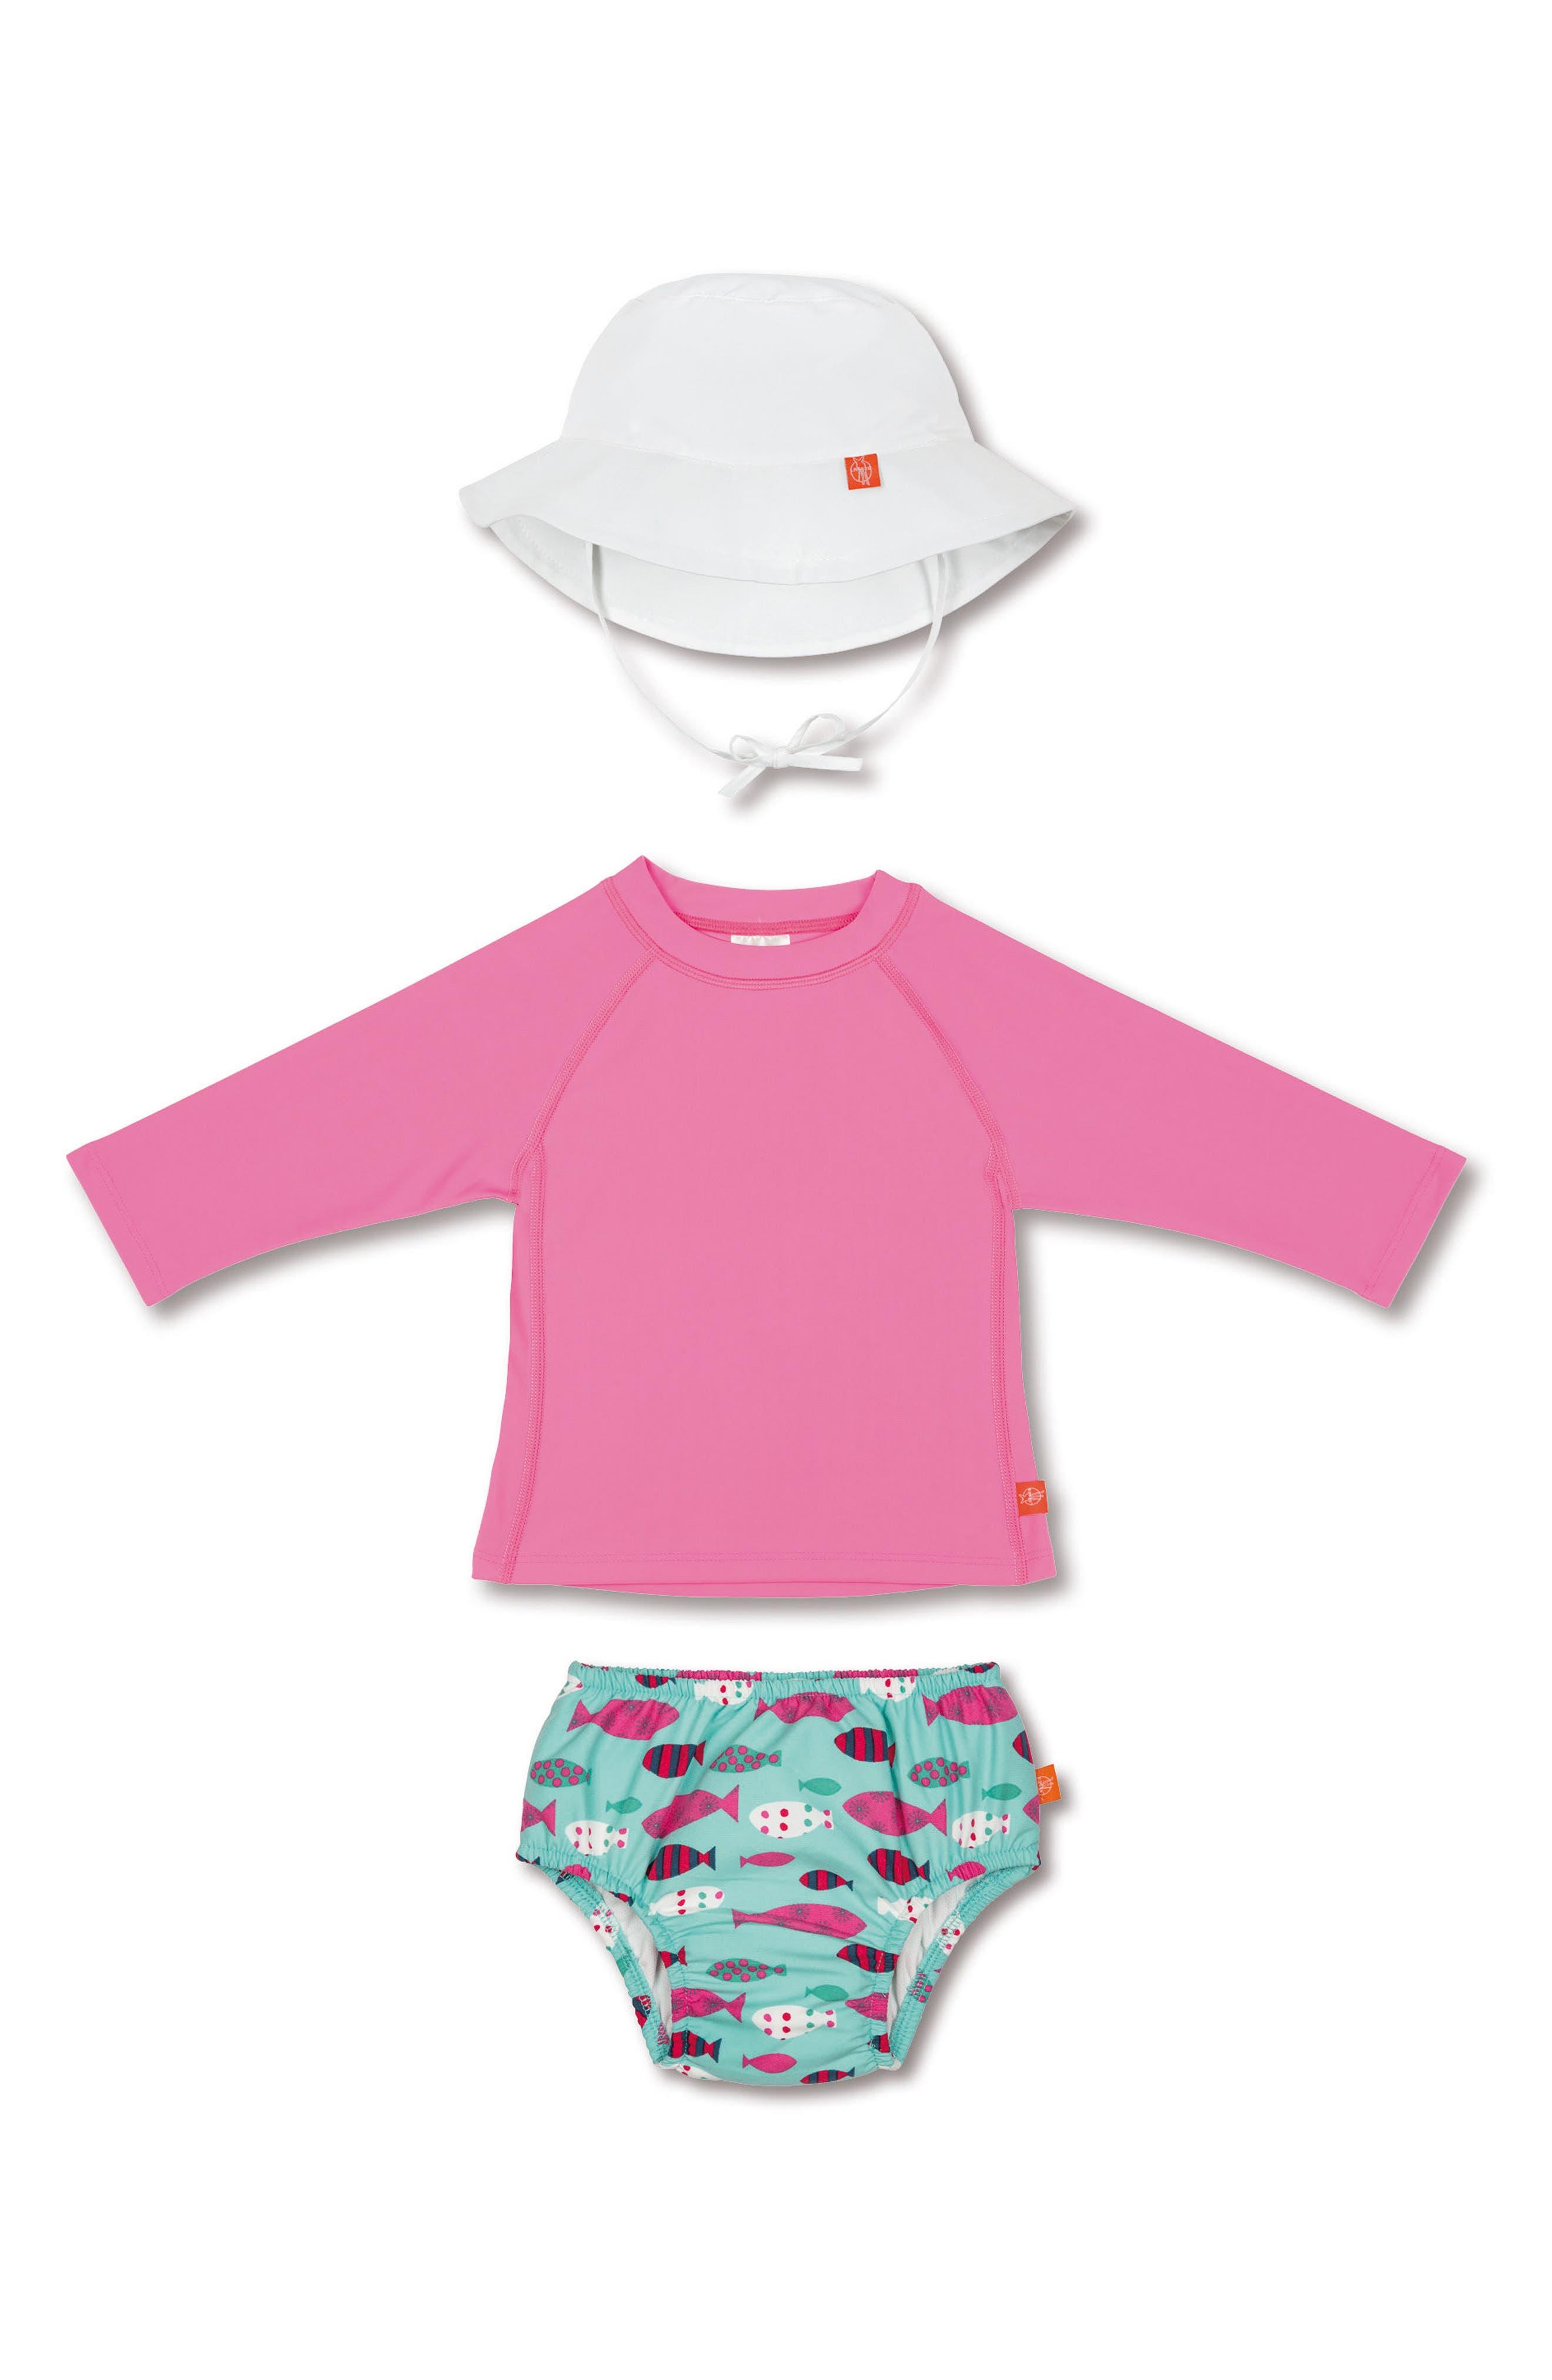 Lassig Two-Piece Rashguard Swimsuit & Hat Set,                             Main thumbnail 1, color,                             Mr Fish